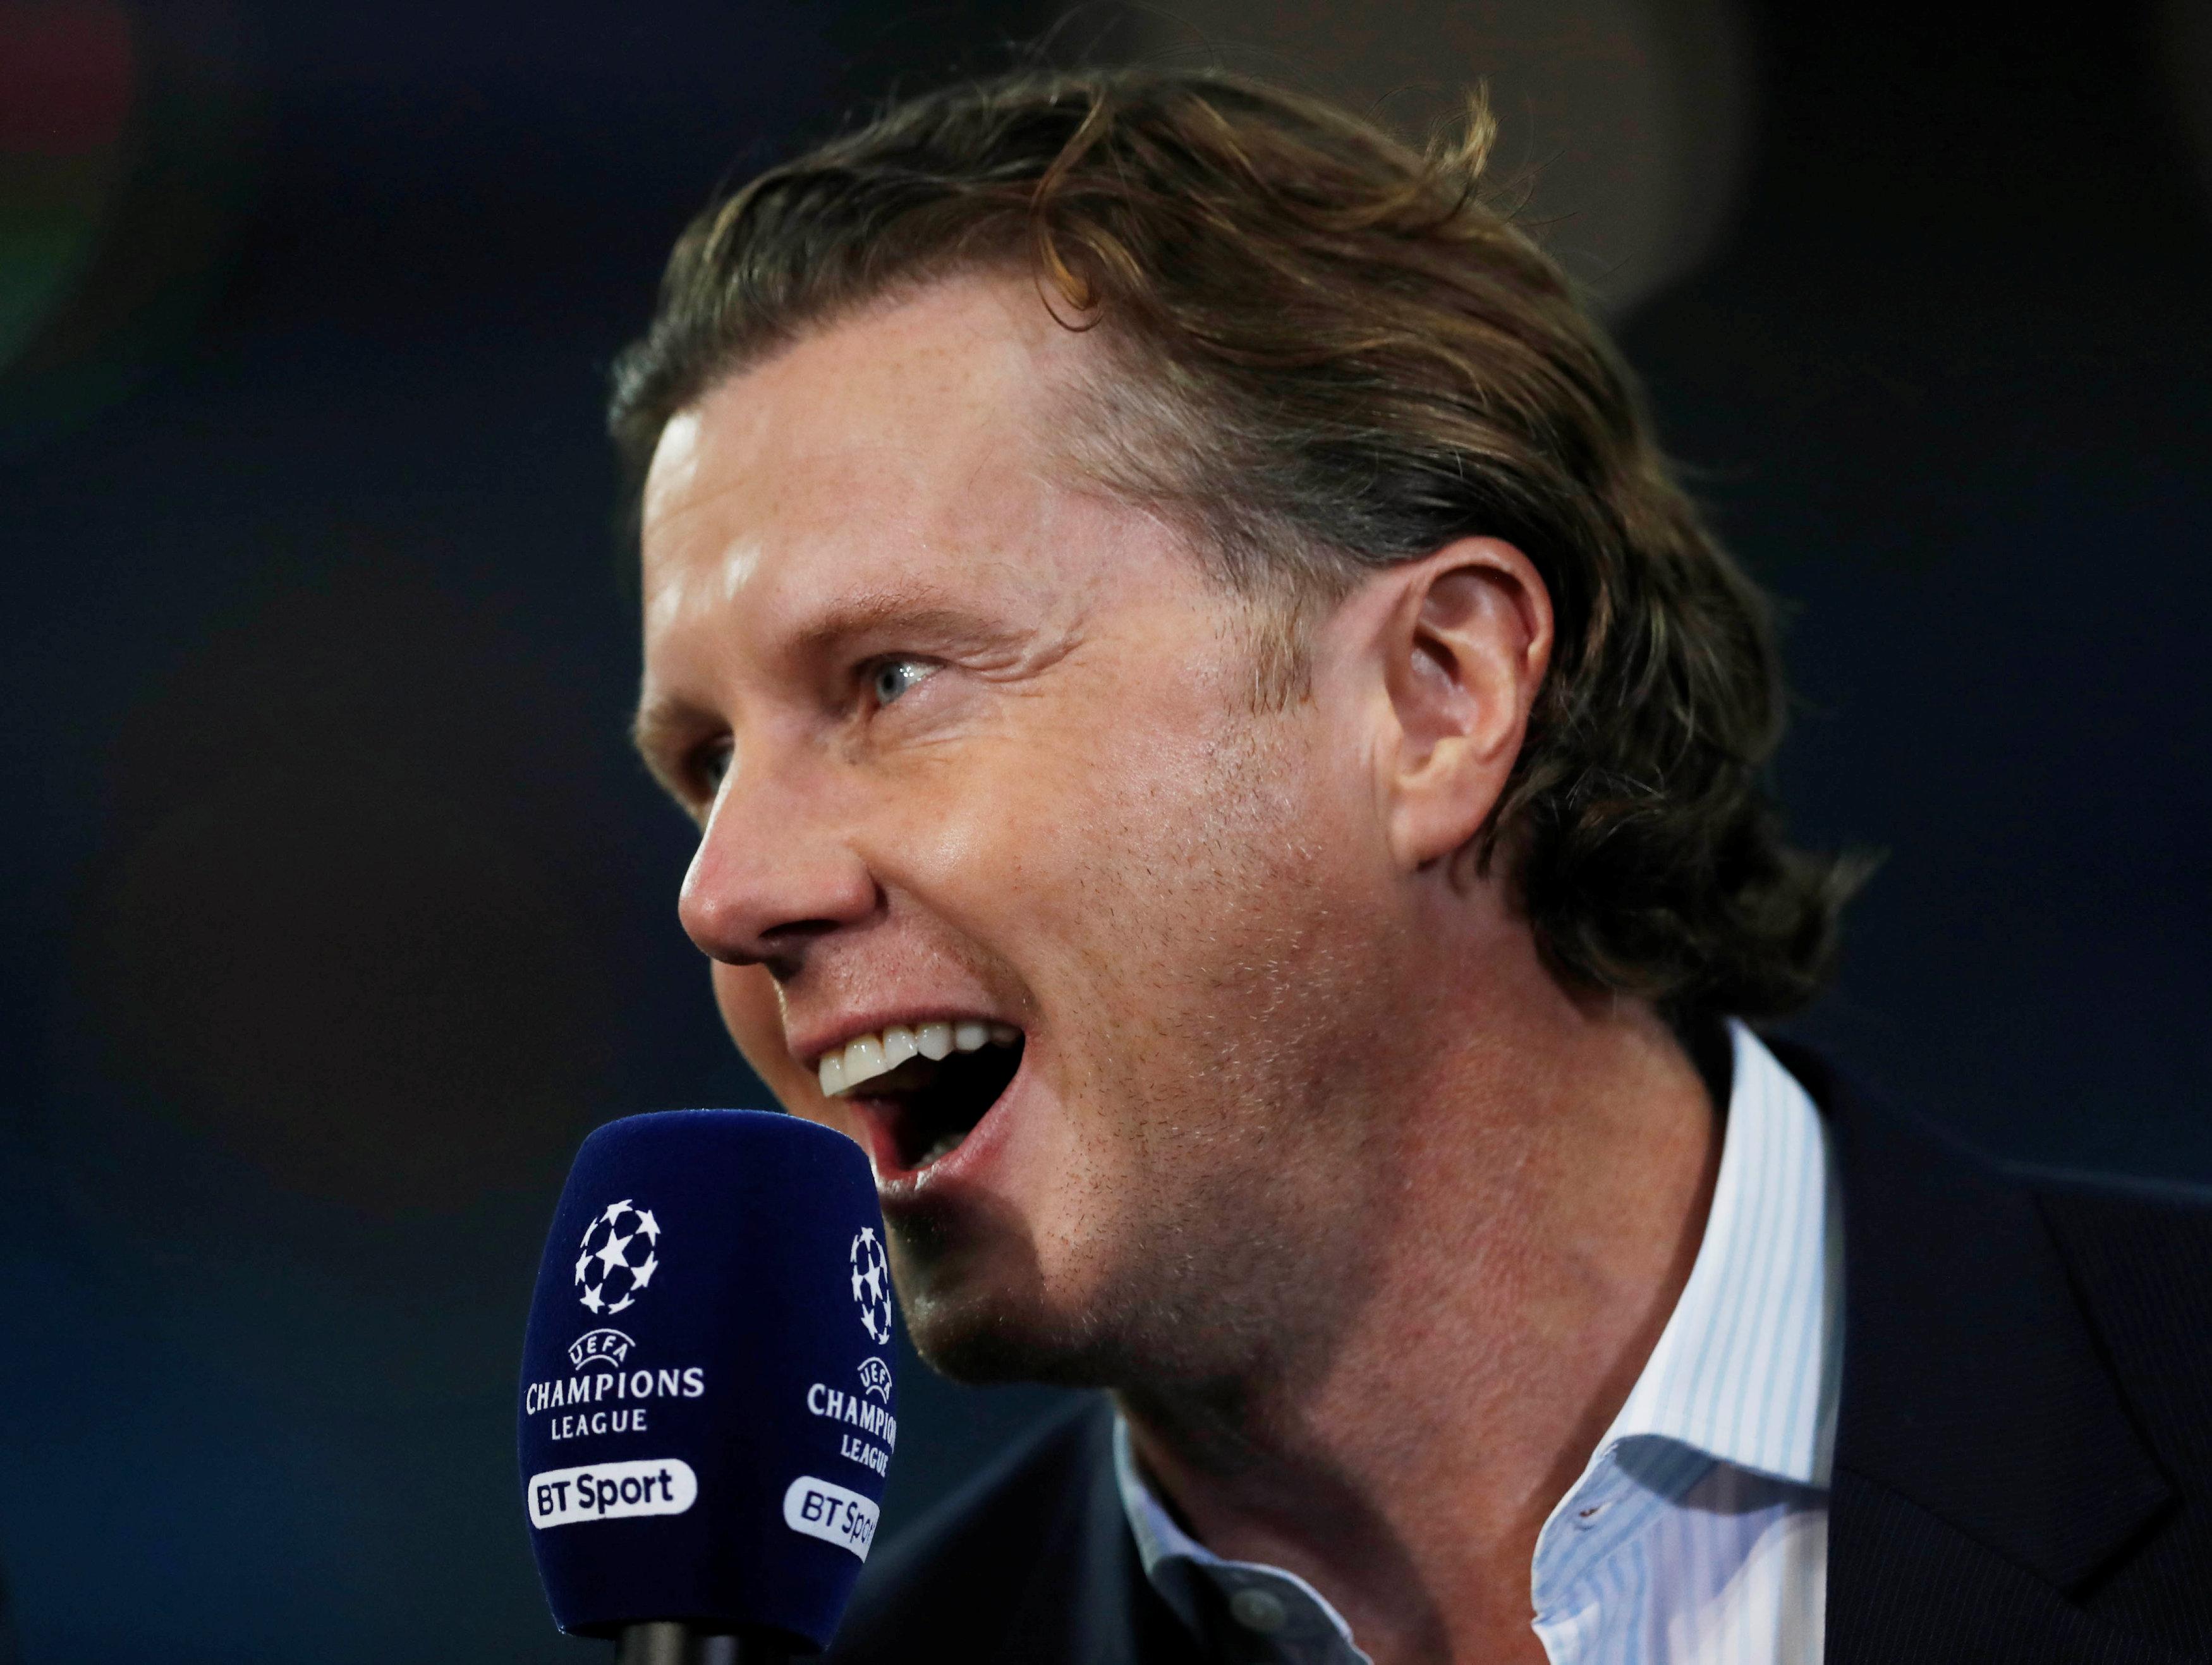 Football: Real's decision to not replace Ronaldo surprising - McManaman